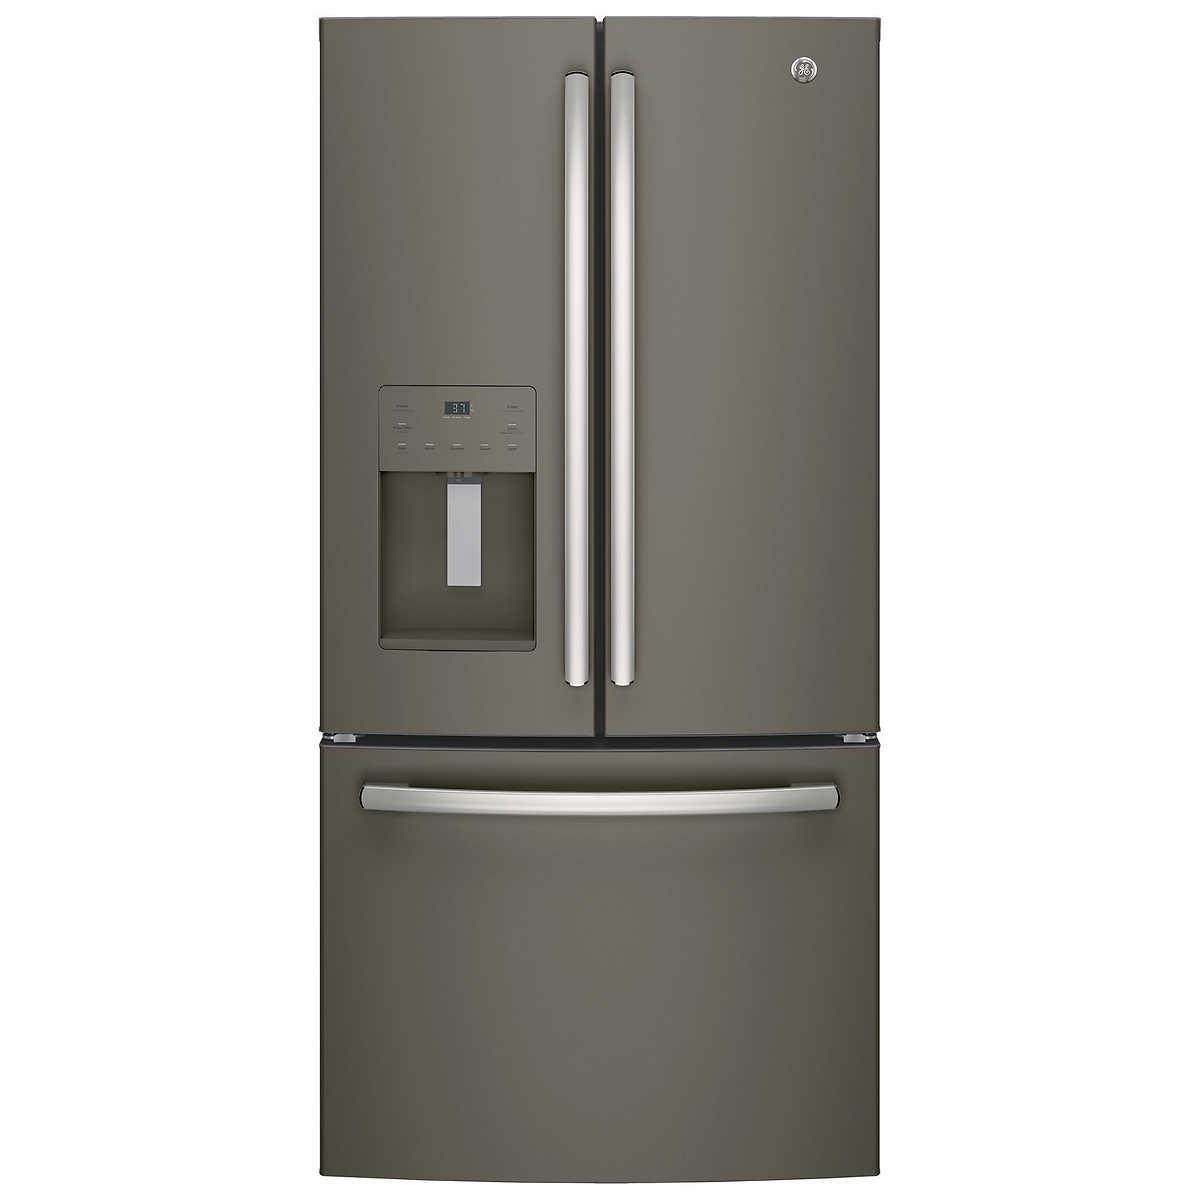 Ge 30 inch side by side white refrigerator - Ge 23 8 Cuft 33 Inch Wide 3 Door French Door Refrigerator In Slate